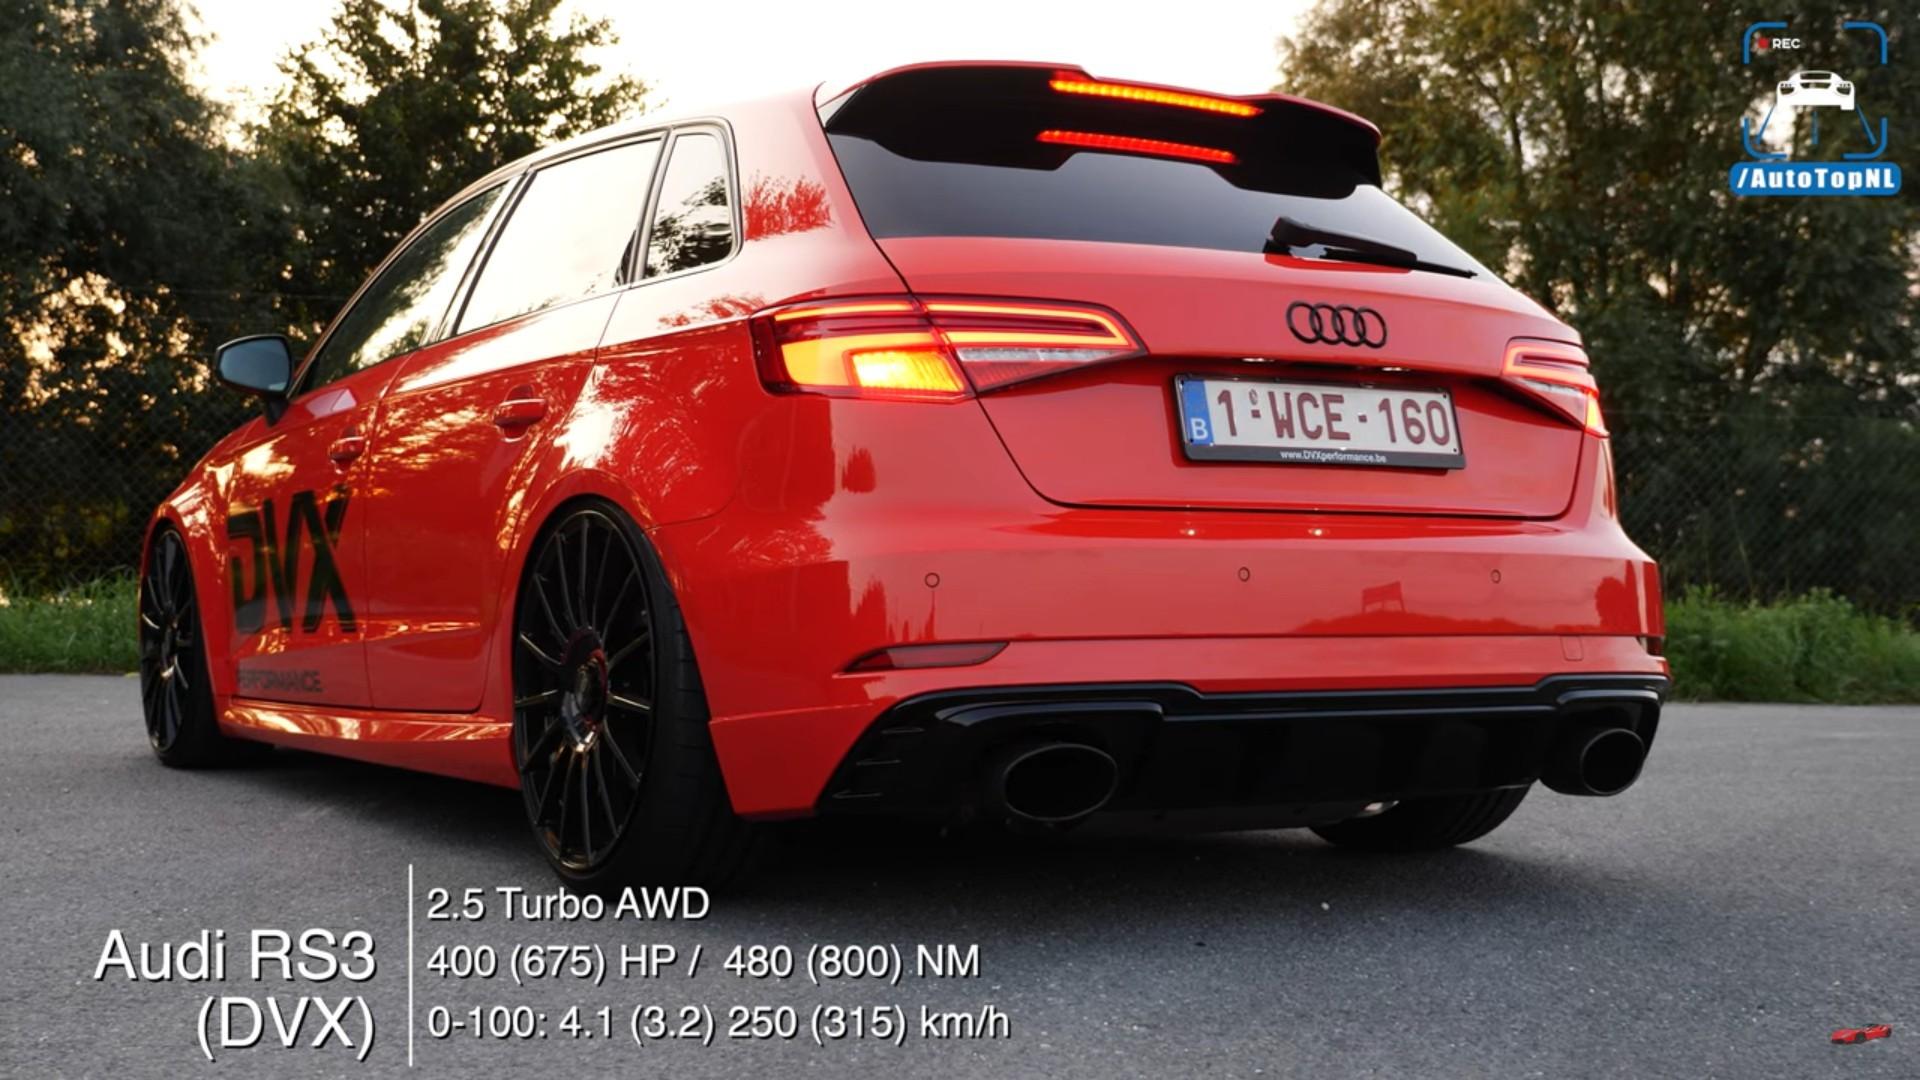 tuned-audi-rs-3-sportback-sounds-like-a-hoot-drives-like-a-rocket-at-198-mph_1.jpg